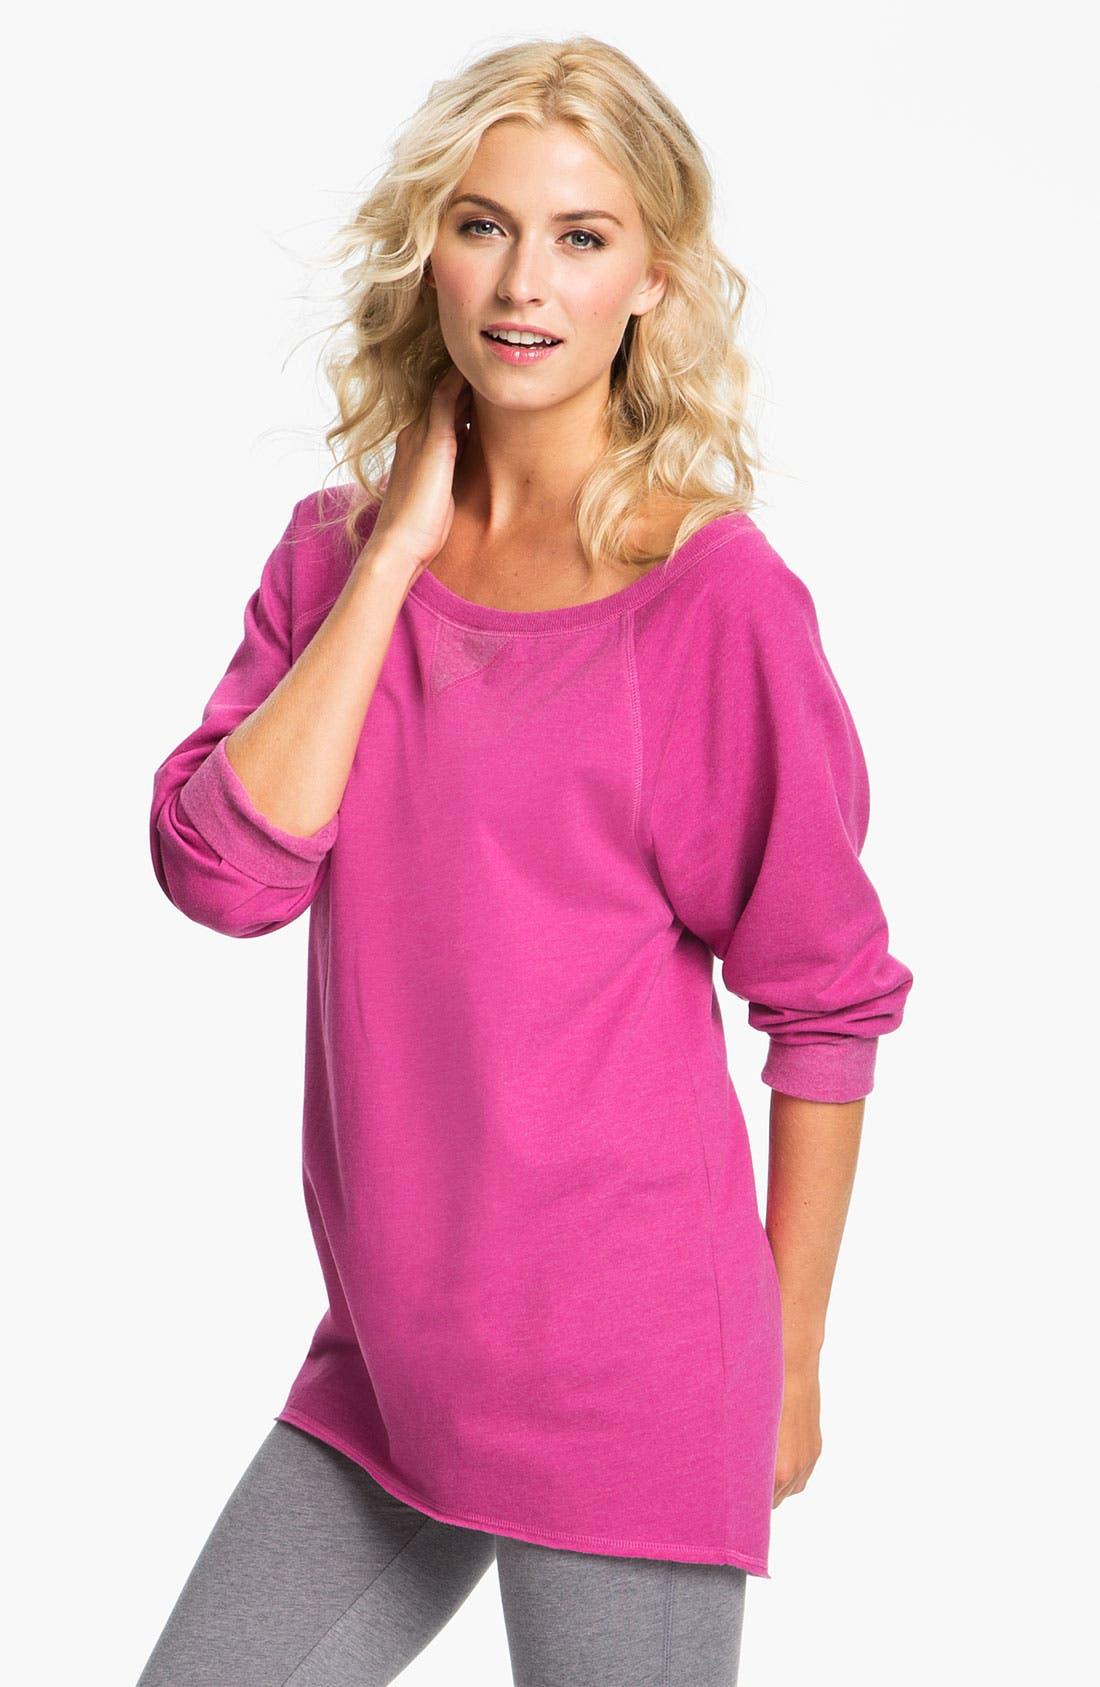 Main Image - Make + Model 'Bundled' Sweatshirt